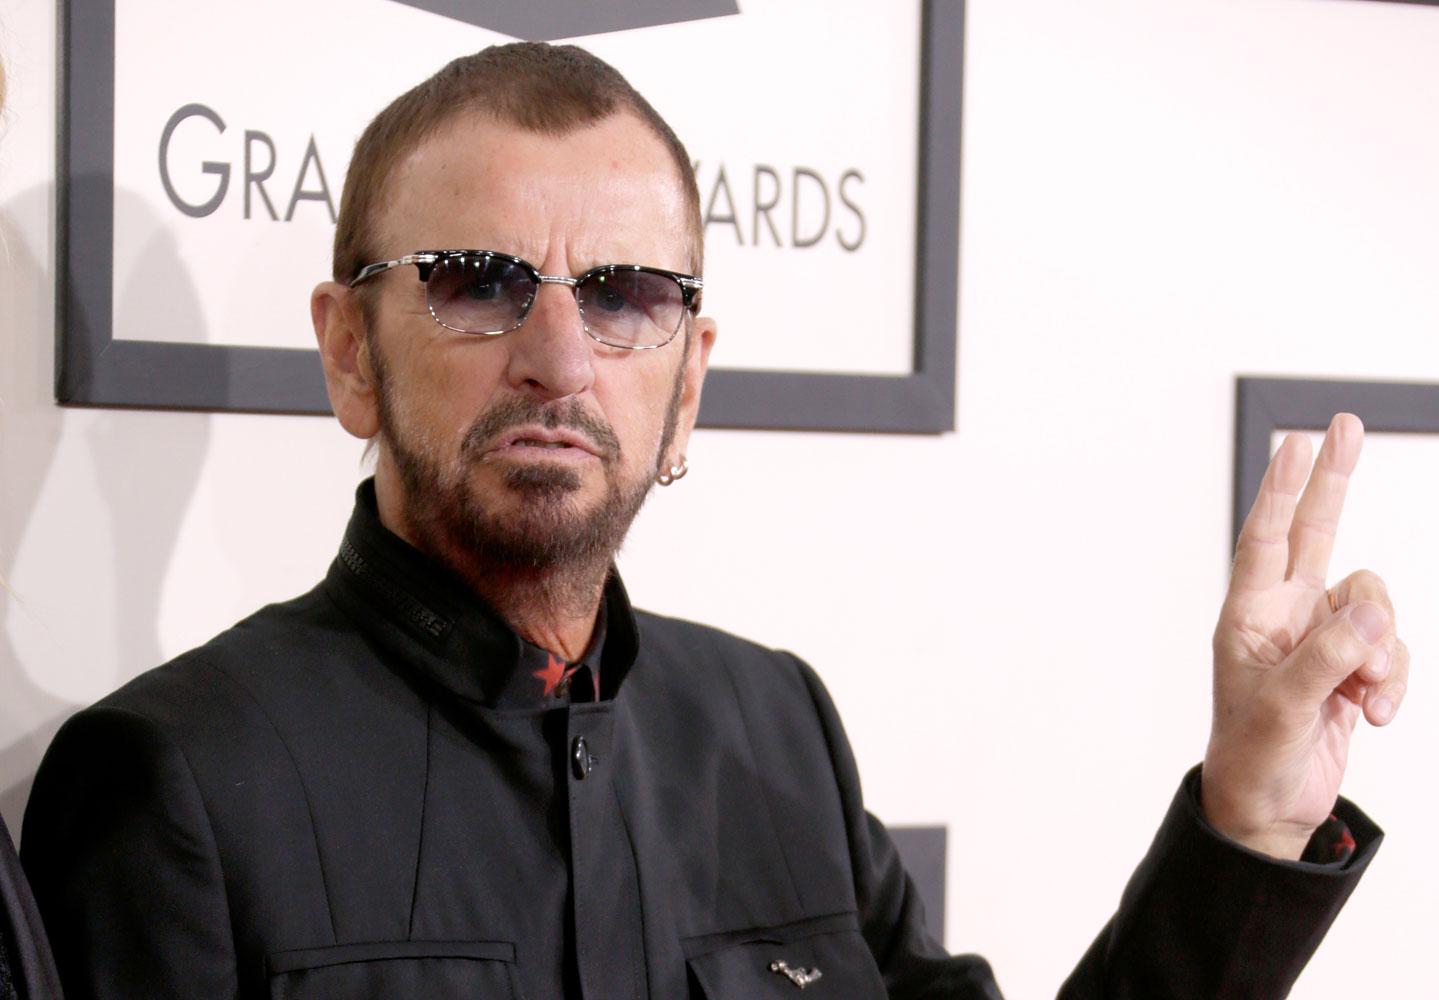 Best World Peace Ambassador - Ringo Starr